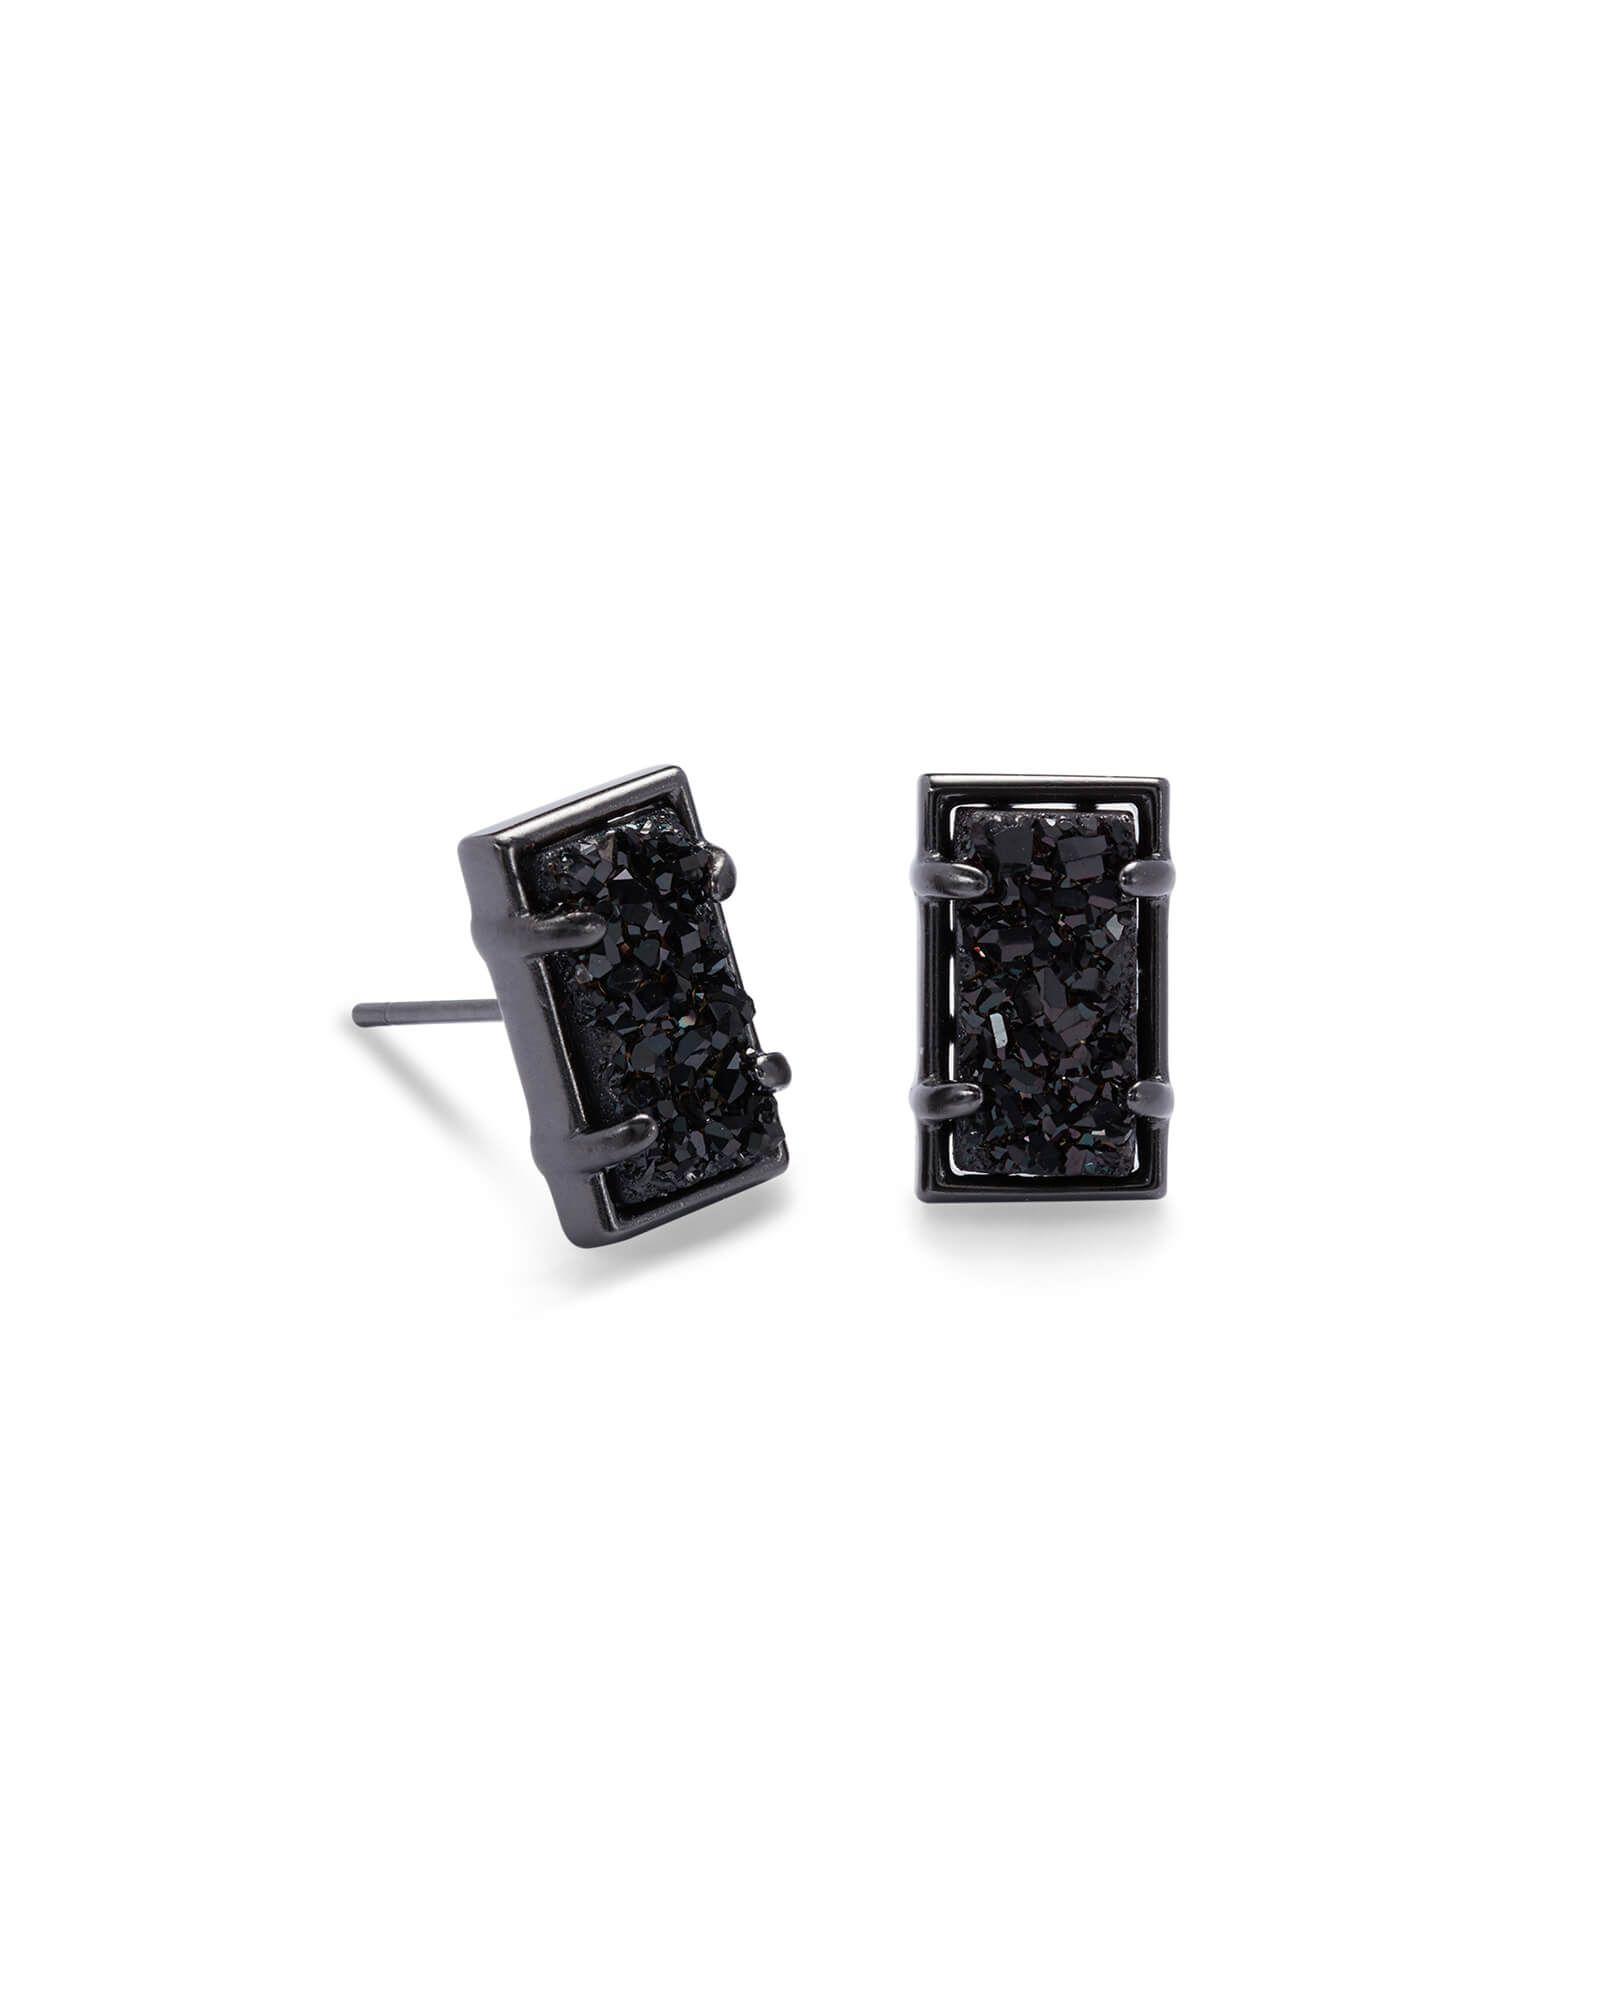 Paola Gunmetal Stud Earrings In Black Drusy